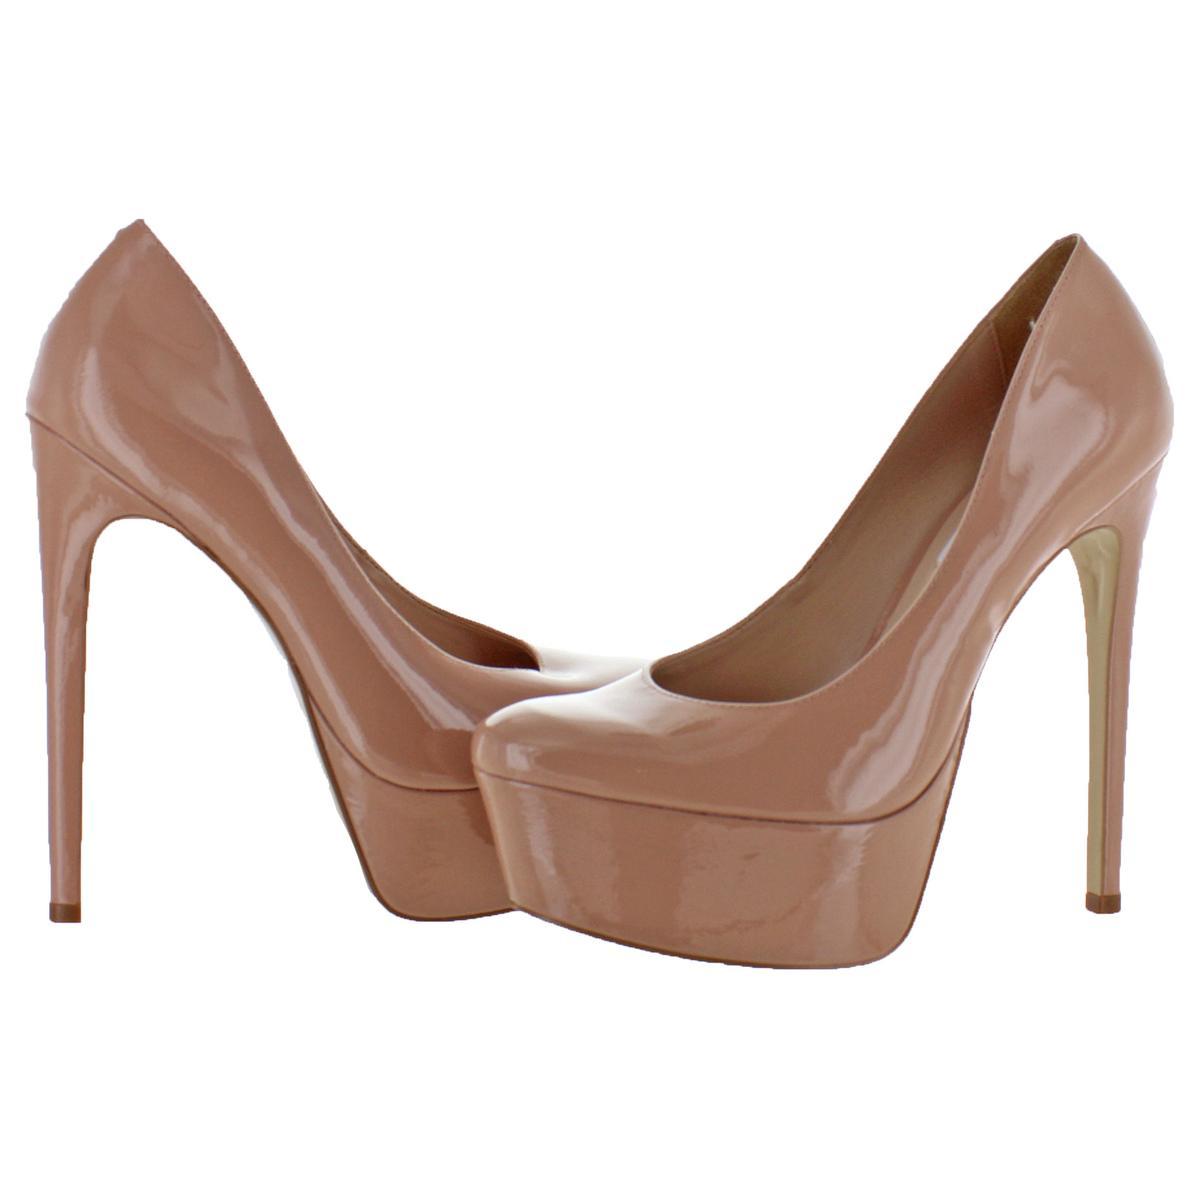 Steve-Madden-Womens-Deserve-Solid-Dress-Pumps-Platforms-BHFO-0713 thumbnail 7